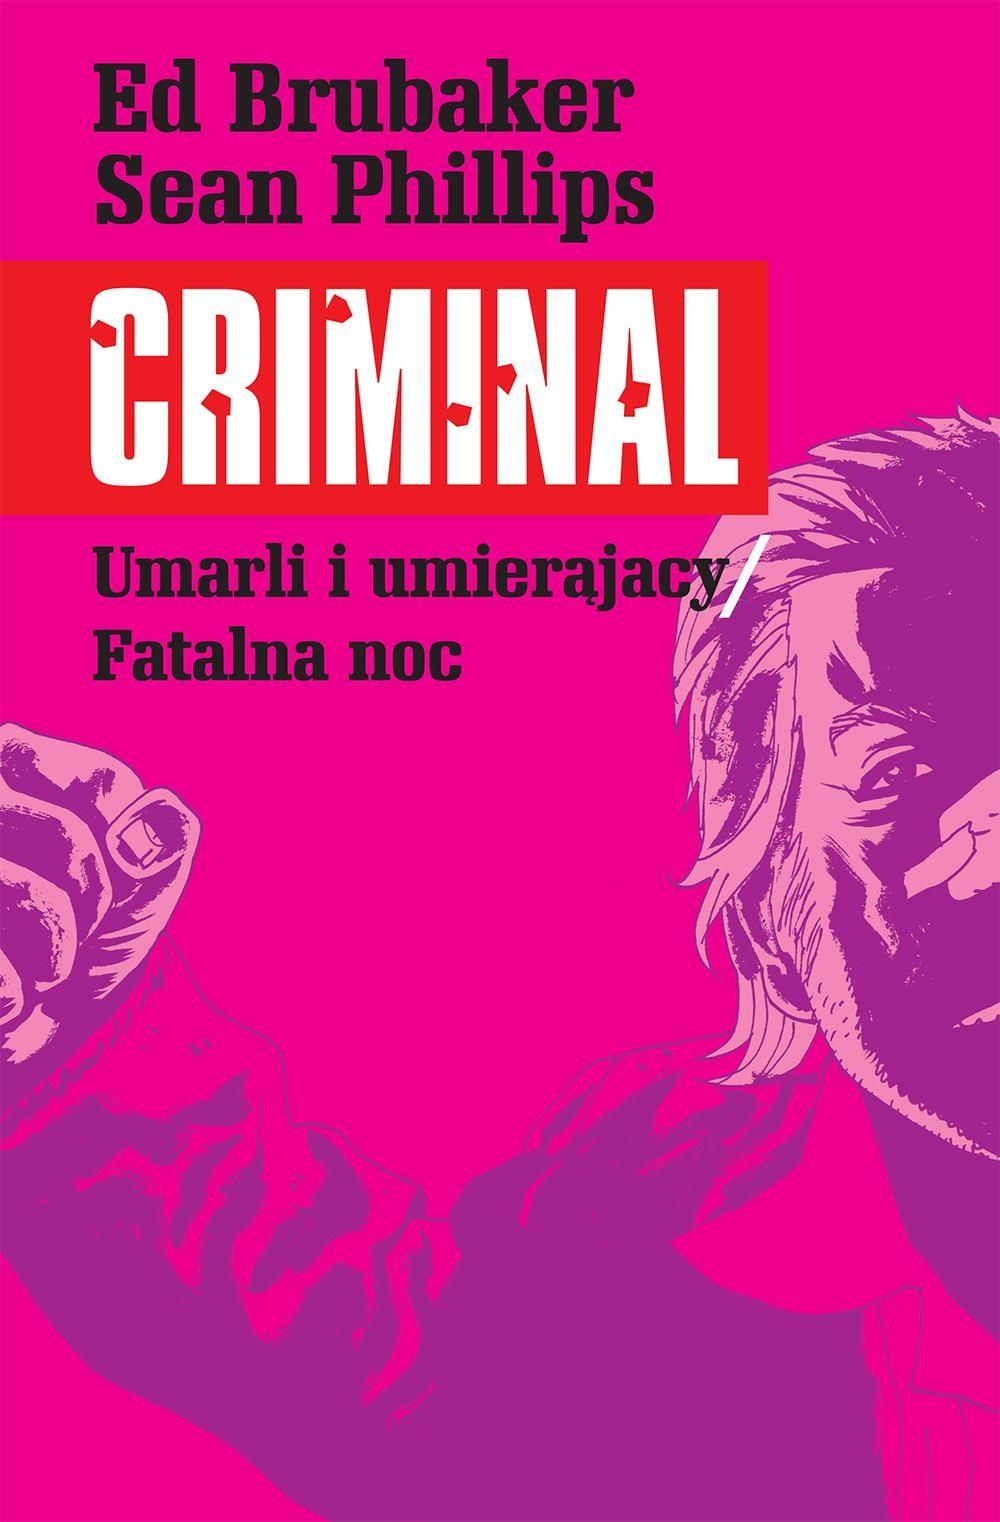 criminal-1.jpg